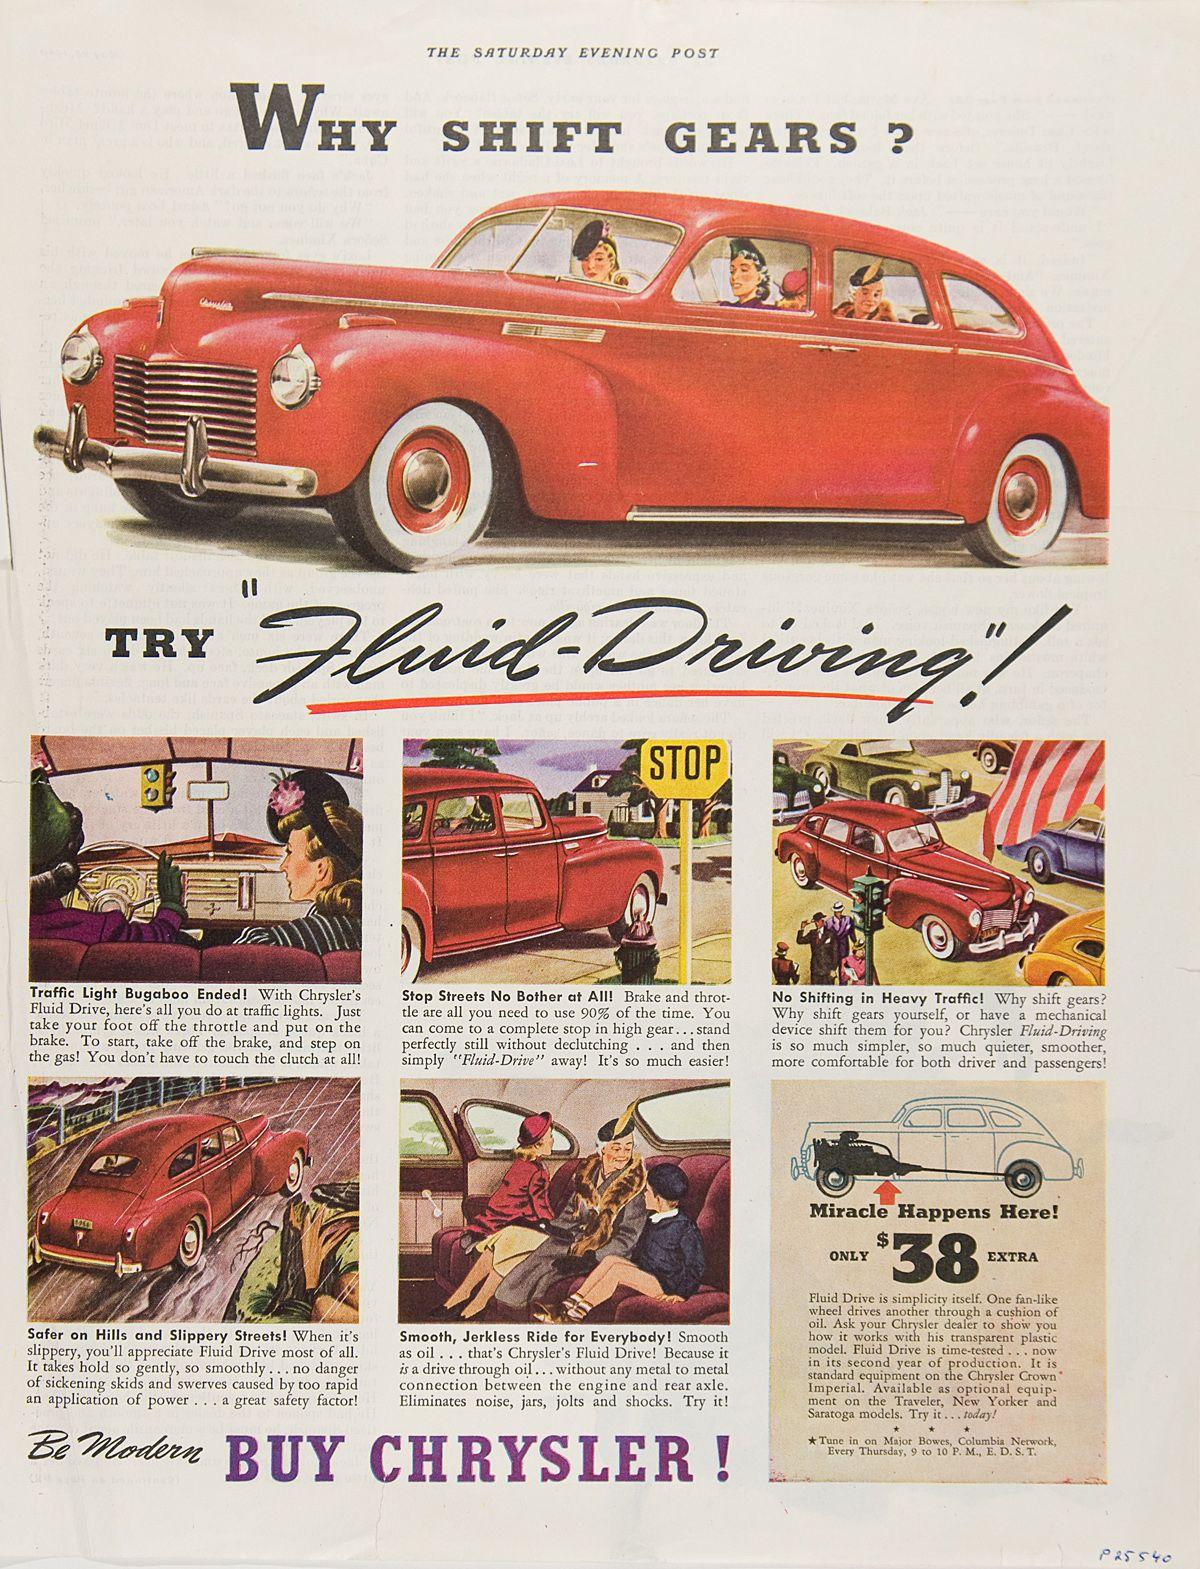 1940 Chrysler article; Vintage car ad. | Road Trip | Pinterest ...